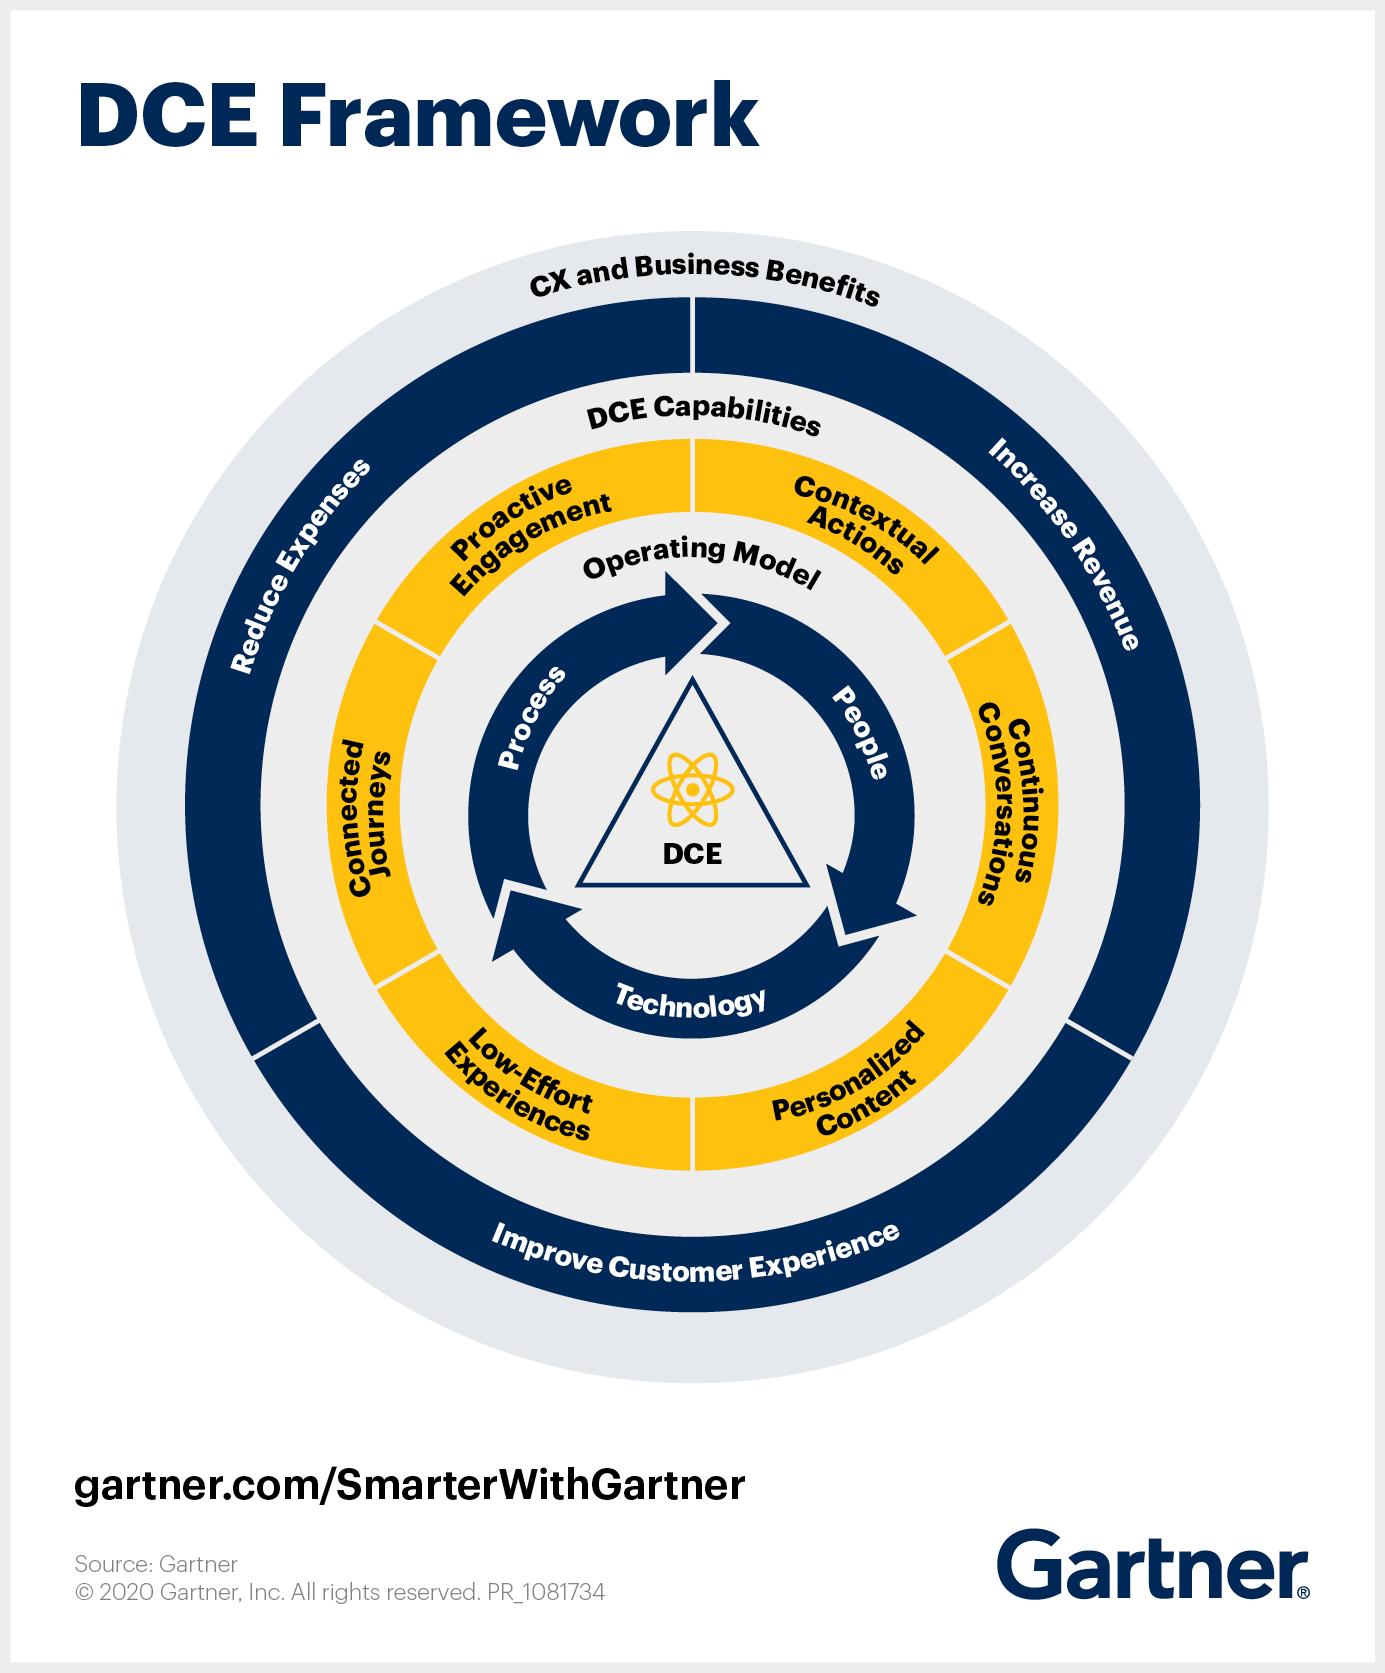 This Gartner dynamic customer engagement framework illustrates how the framework transforms the customer service experience.